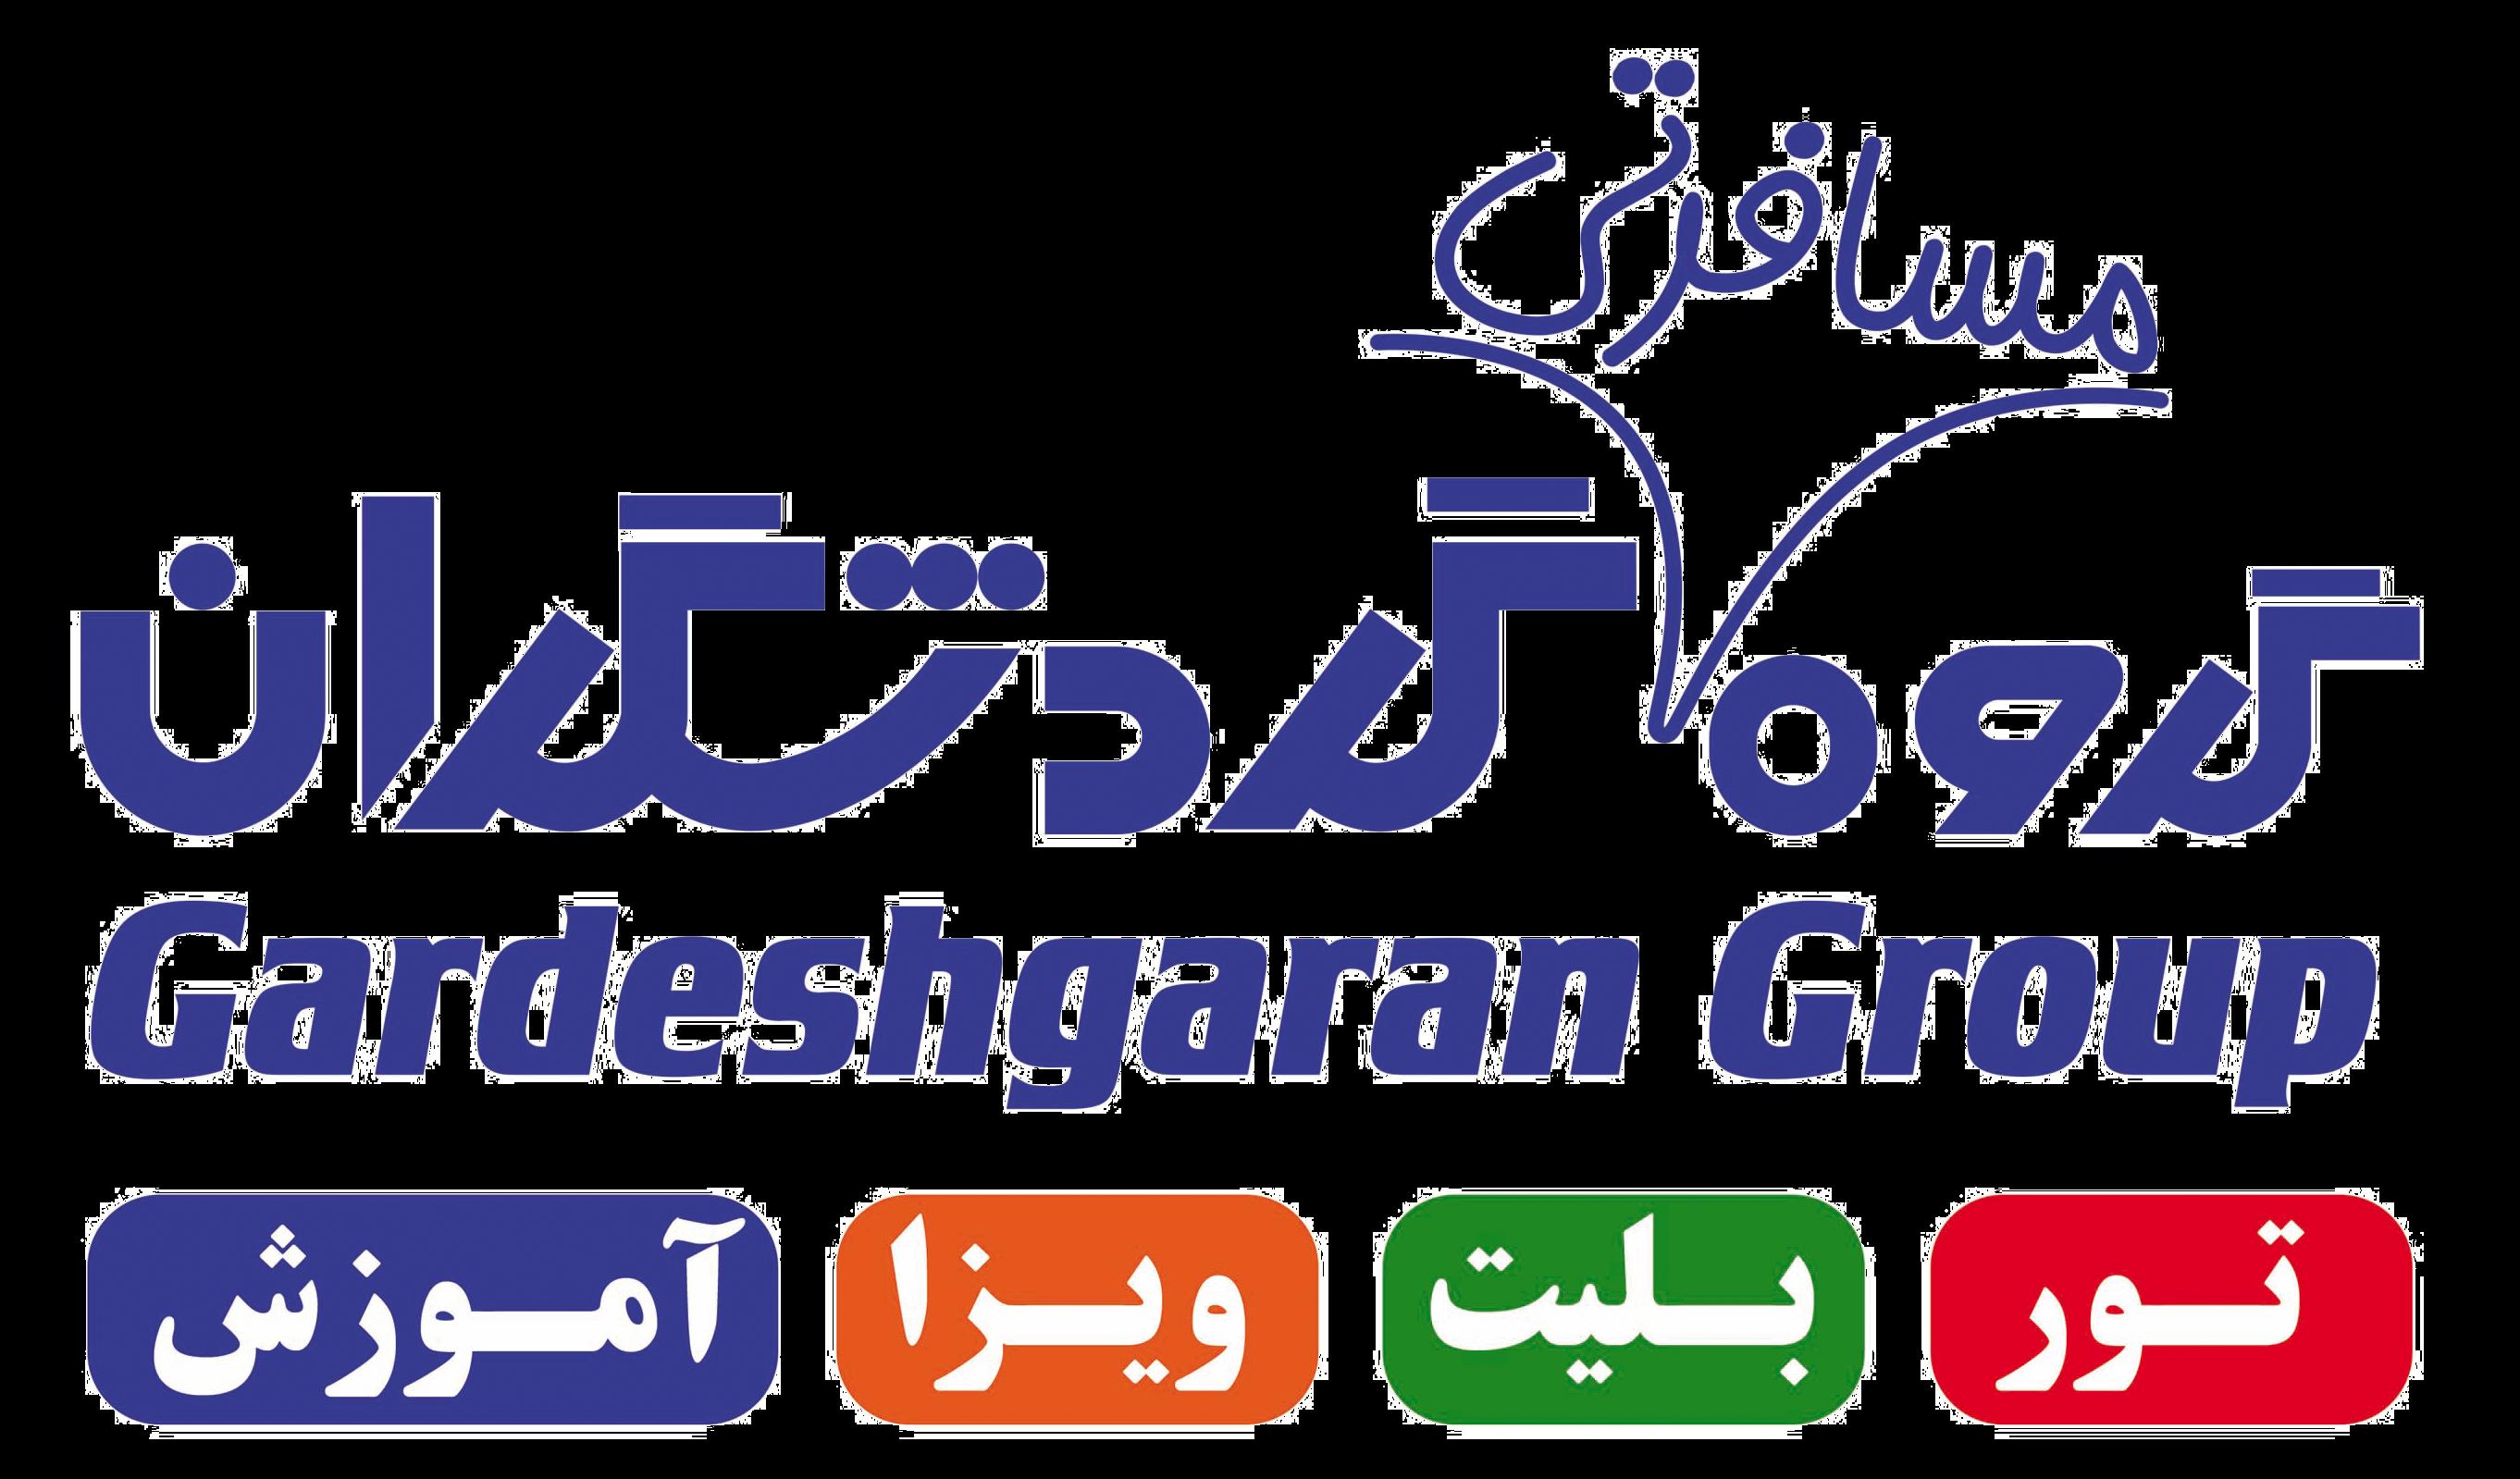 gardeshgaran